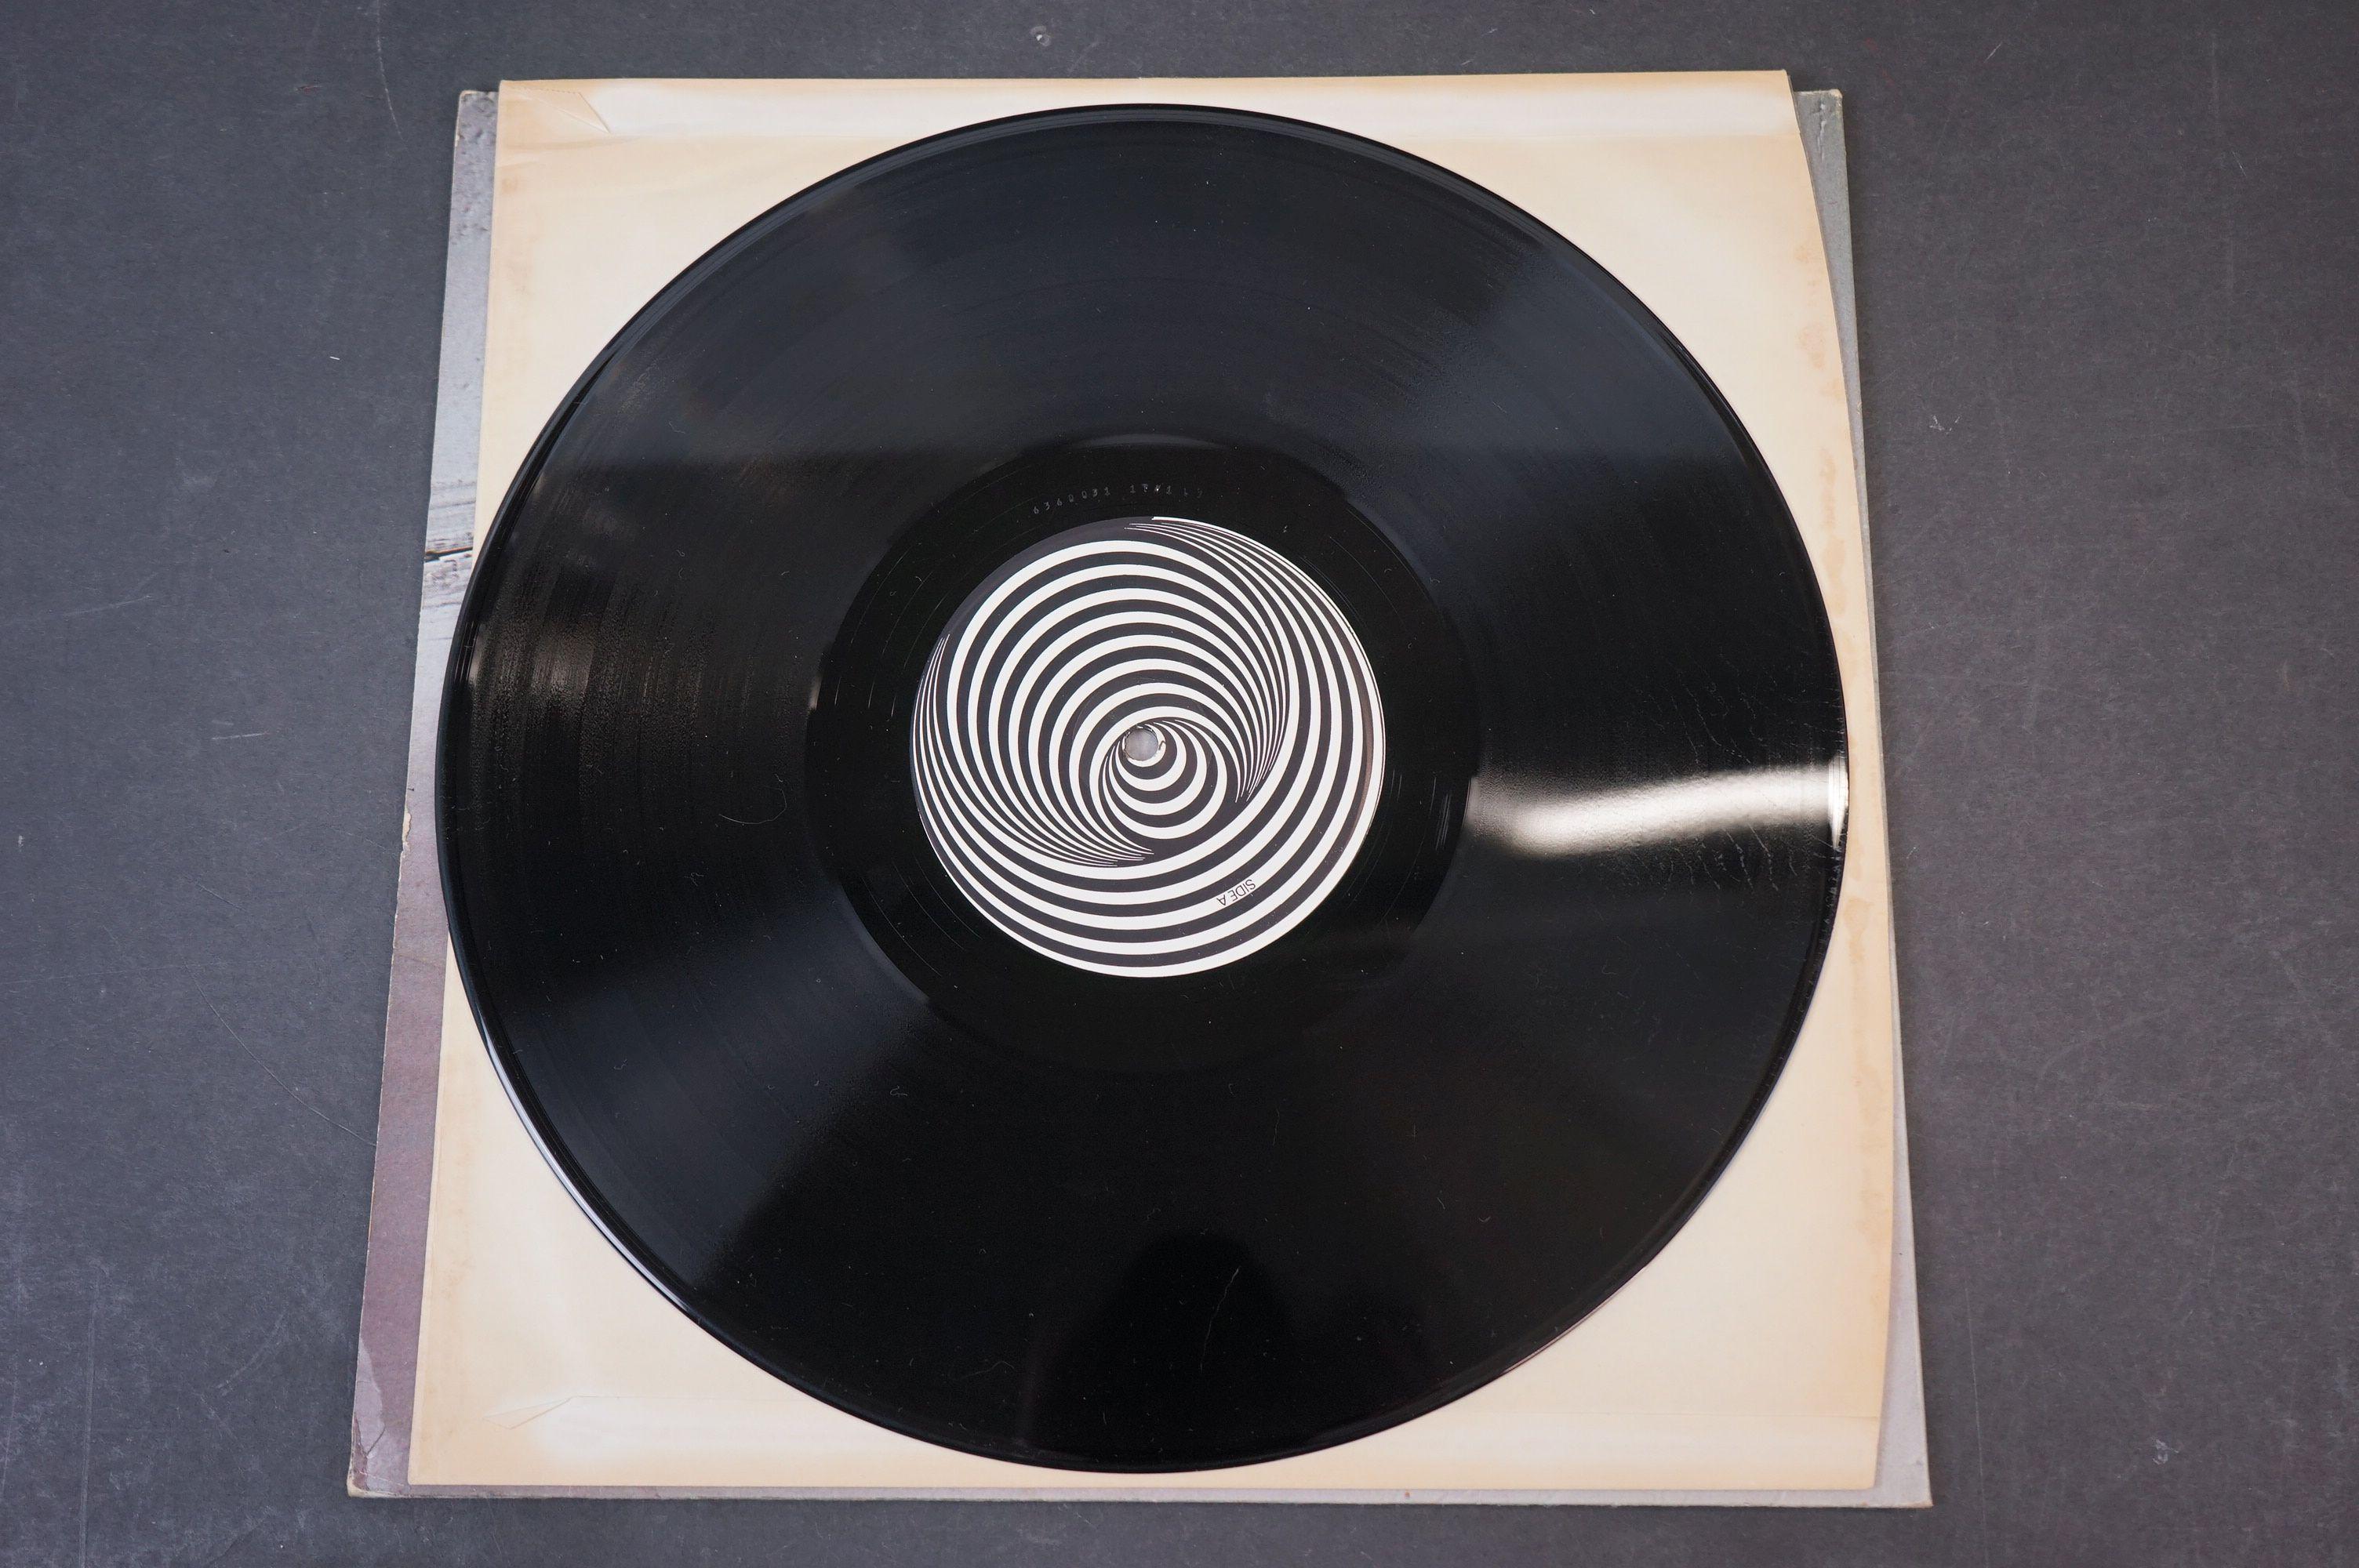 Vinyl - Nirvana Local Anaesthetic LP on Vertigo VO 6360031 gatefold sleeve, swirl logo, swirl - Image 7 of 8